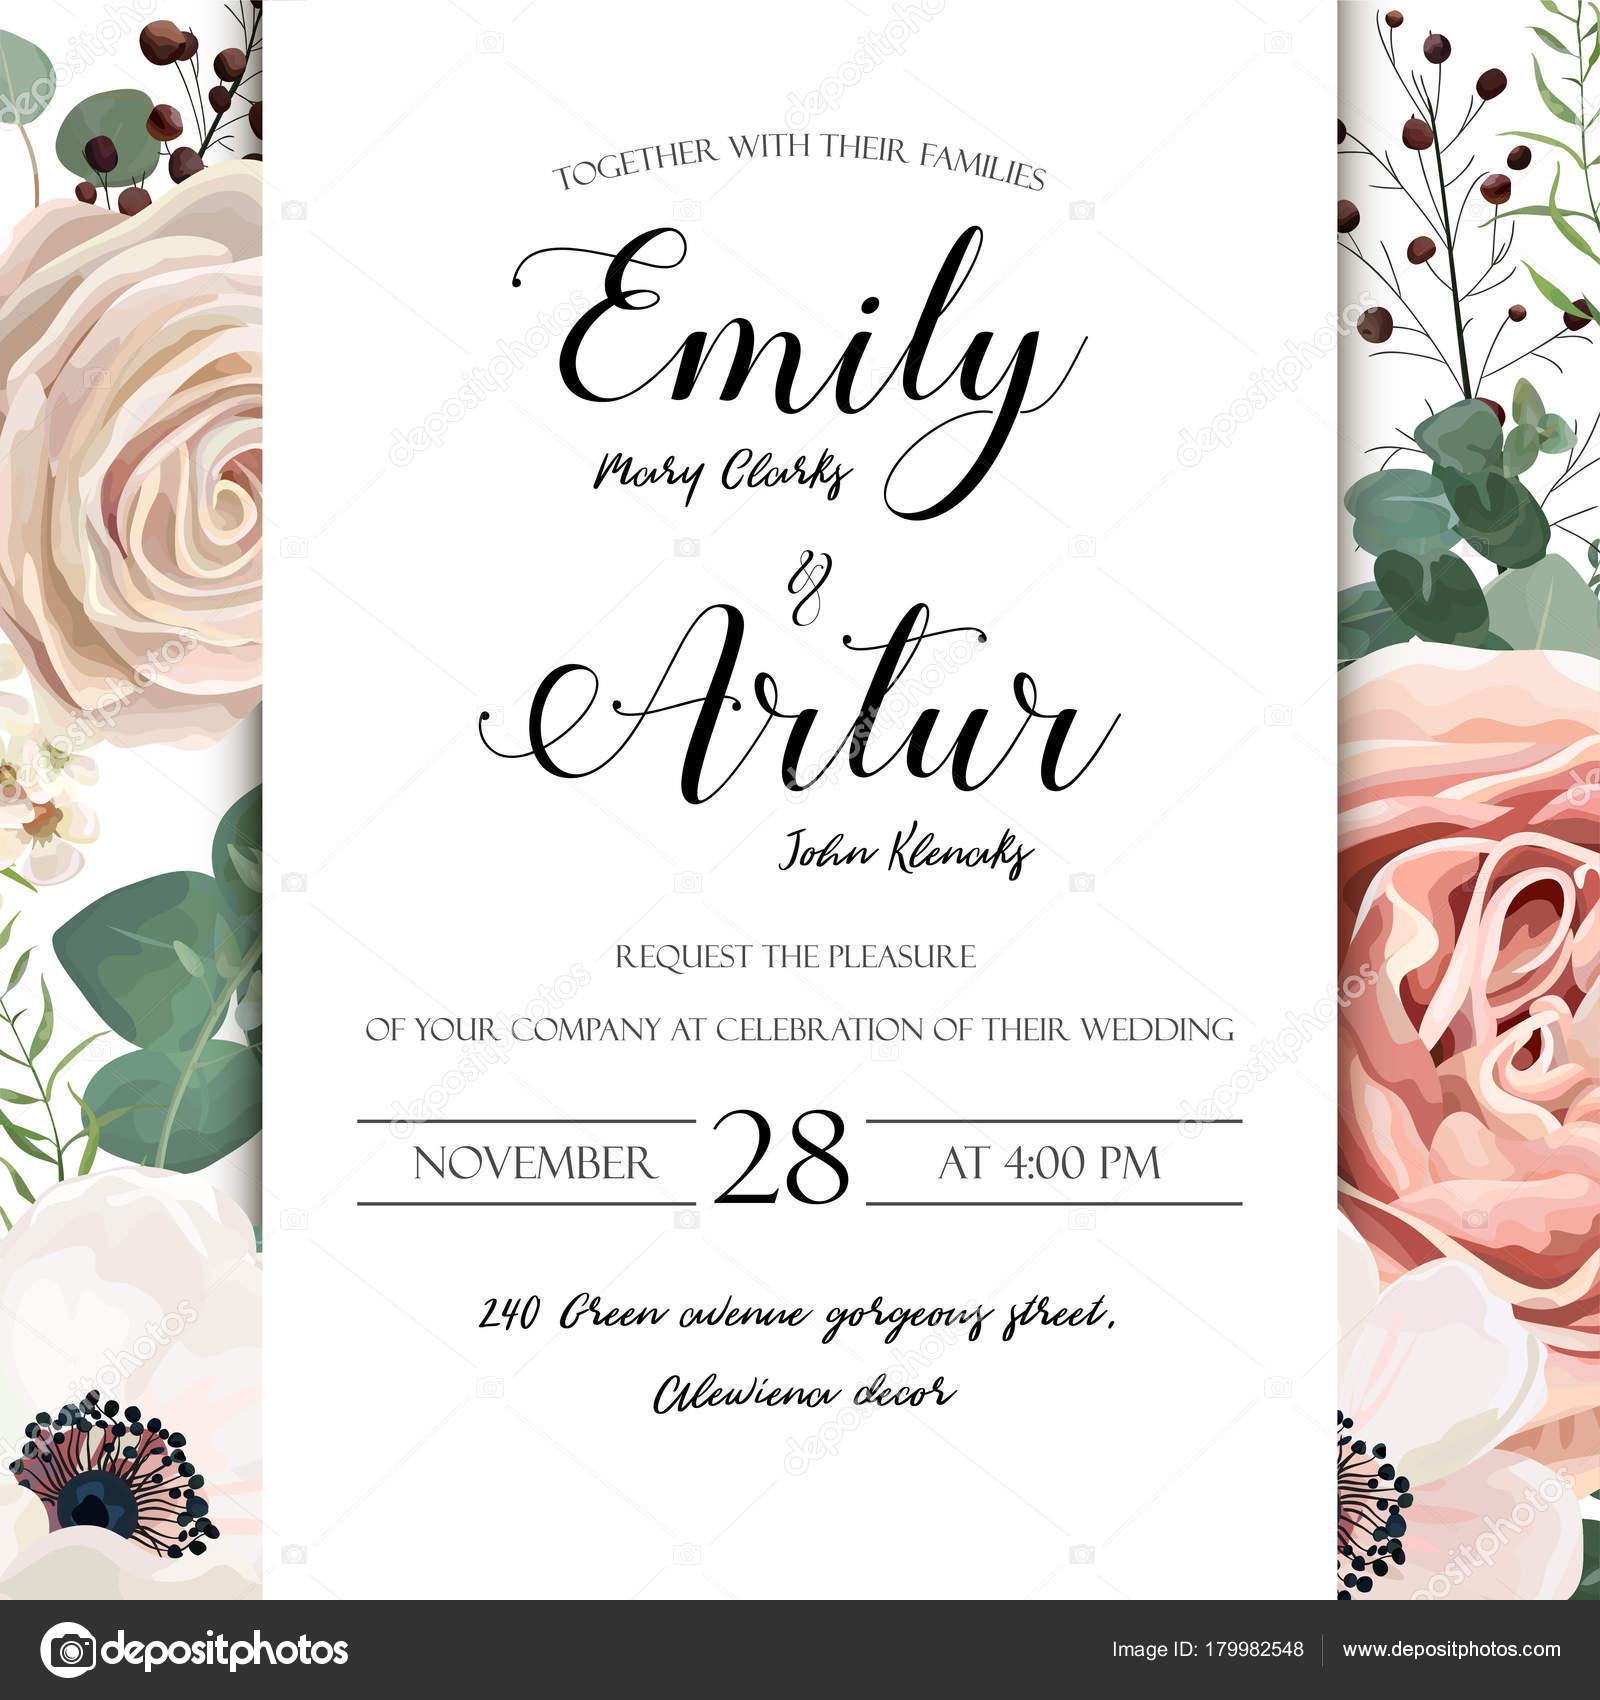 5 Blue Floral Wedding Invitation Card Vector Material: Floral Wedding Invitation Elegant Invite Card Vector